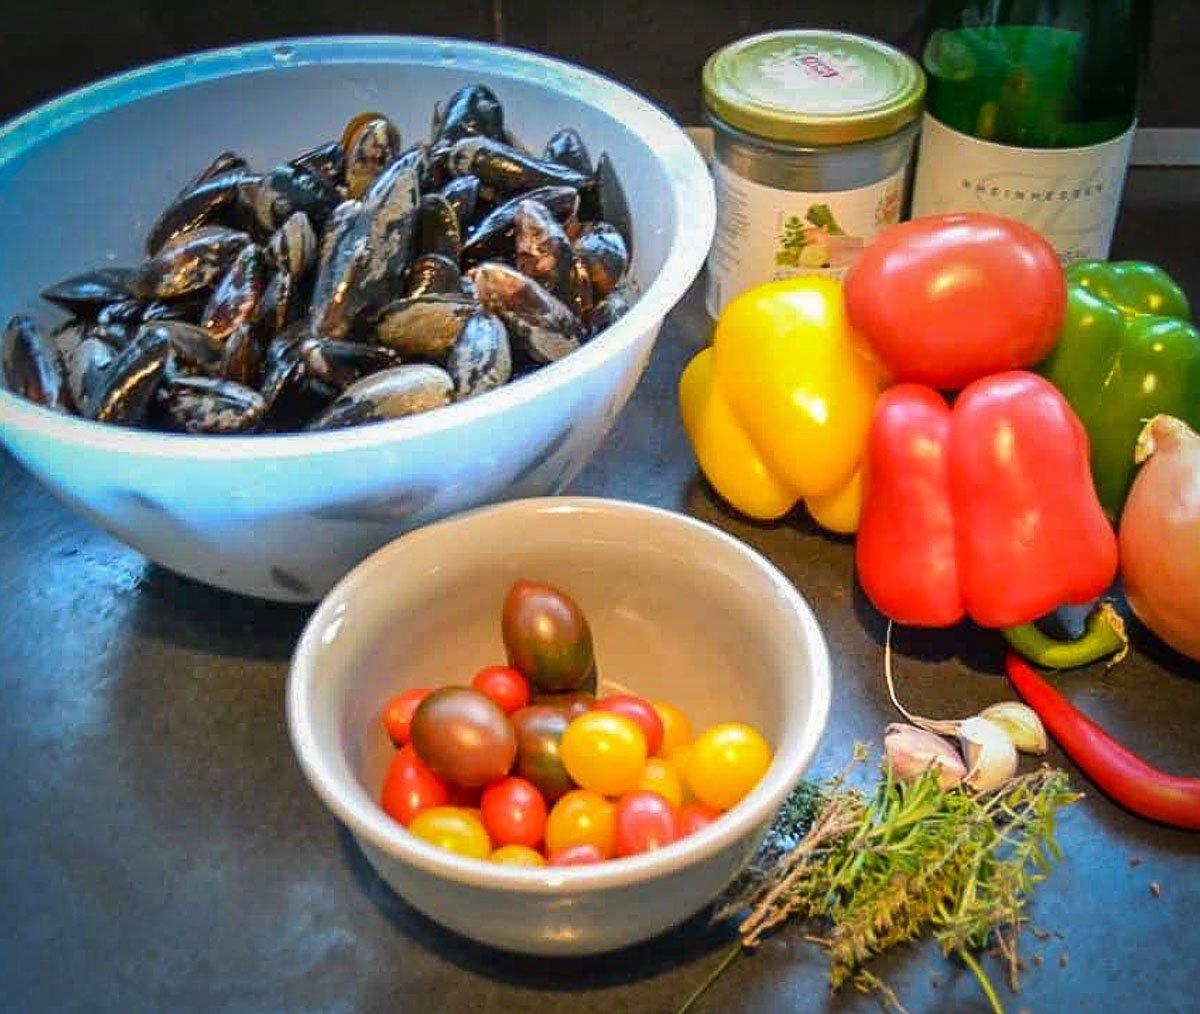 Zutaten Miesmuschel Rezept, Paprika, Muscheln, Chorizo, Kräuter und Tomaten